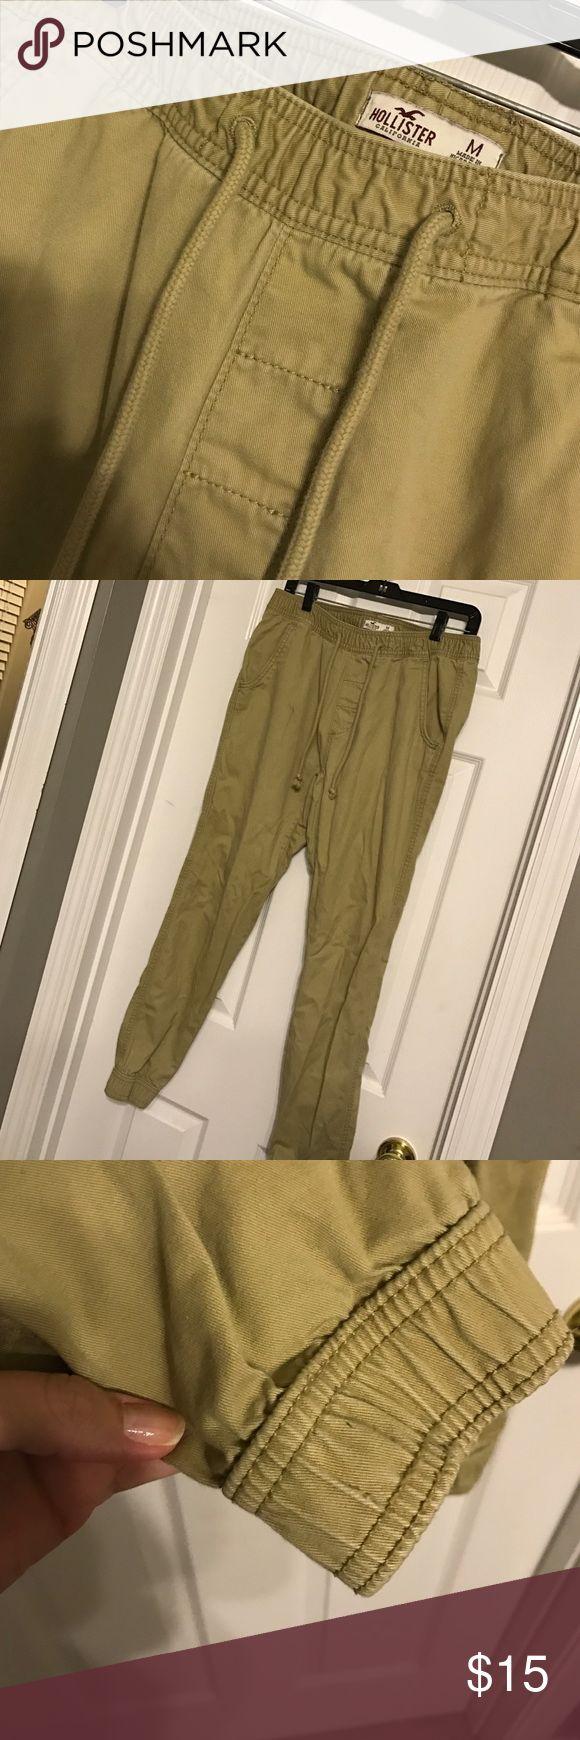 Hollister Khaki Joggers Khaki jogger pants from Hollister. Worn one season, perfect condition! Great for a teenage boy. Hollister Pants Sweatpants & Joggers